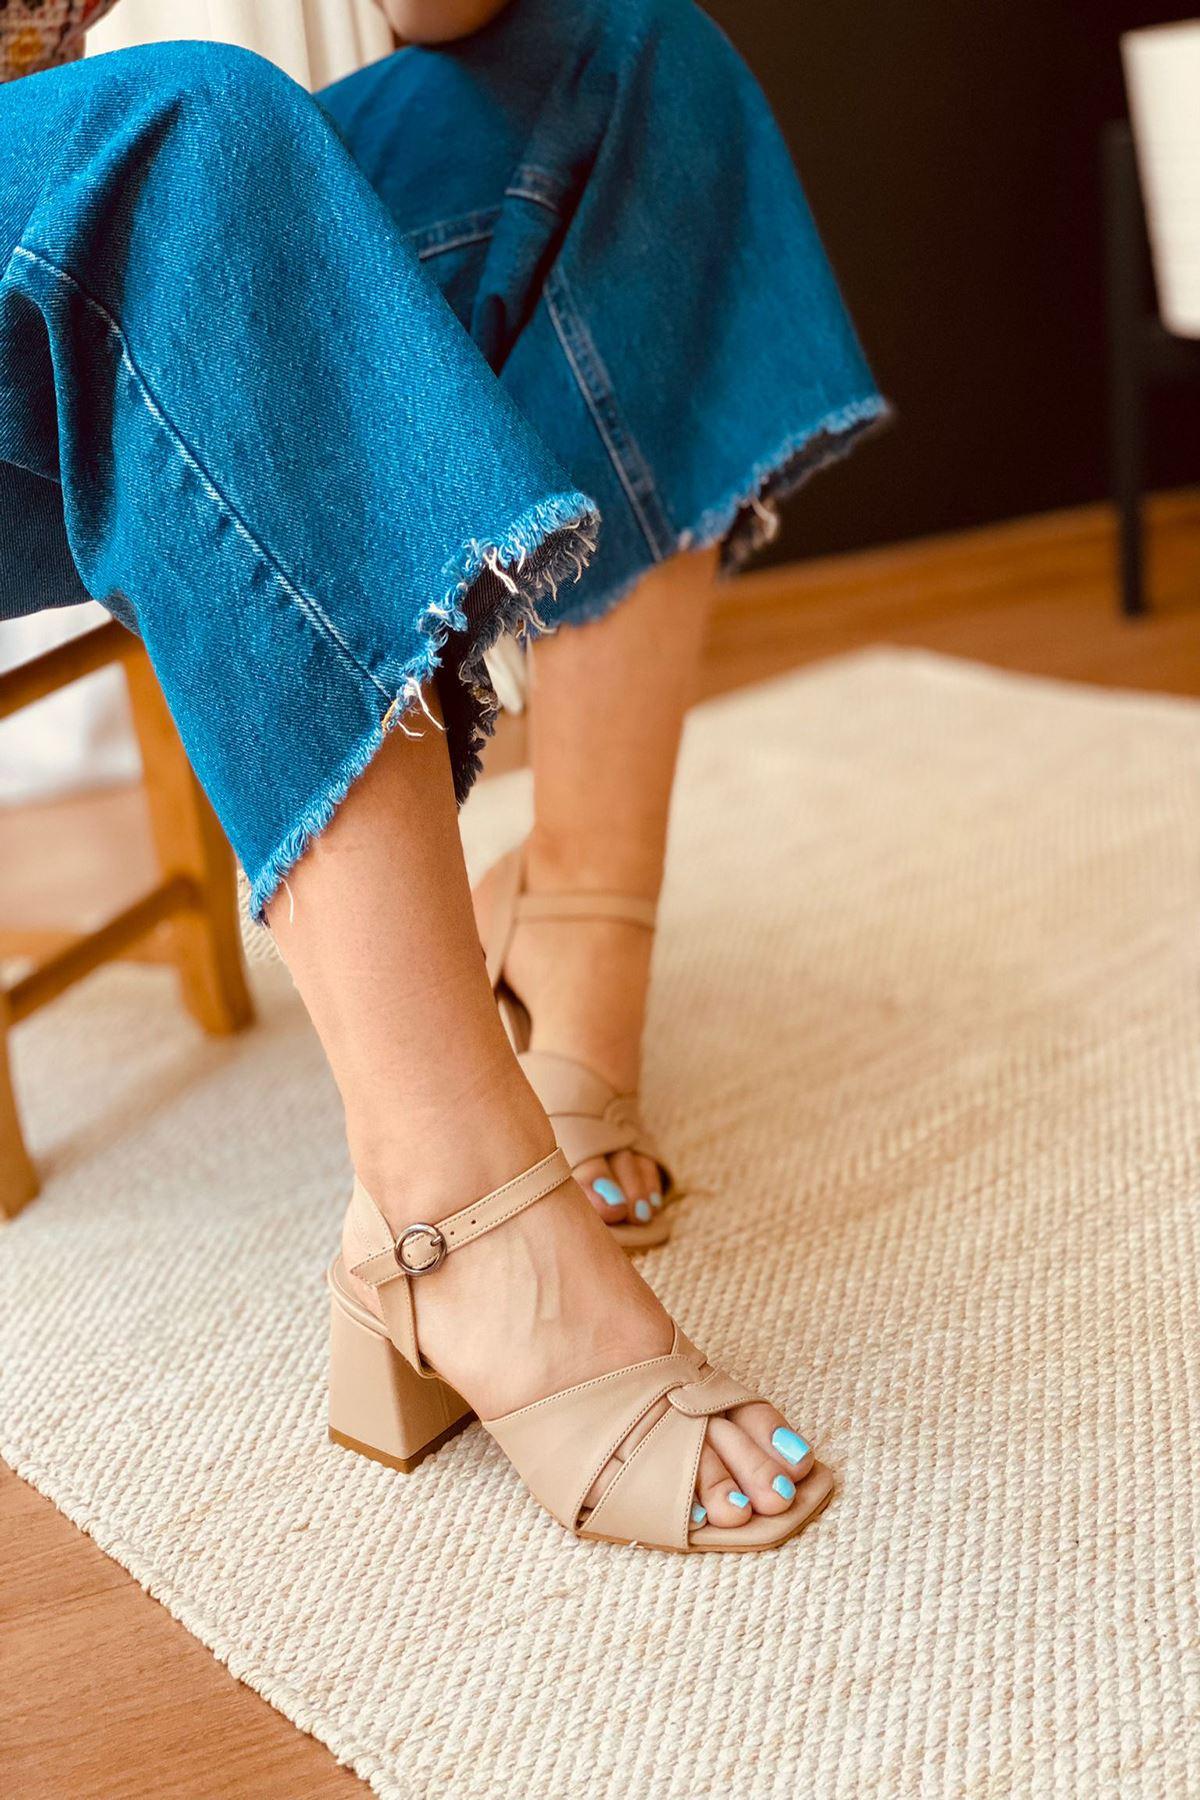 Y711 Ten Cilt Topuklu Ayakkabı